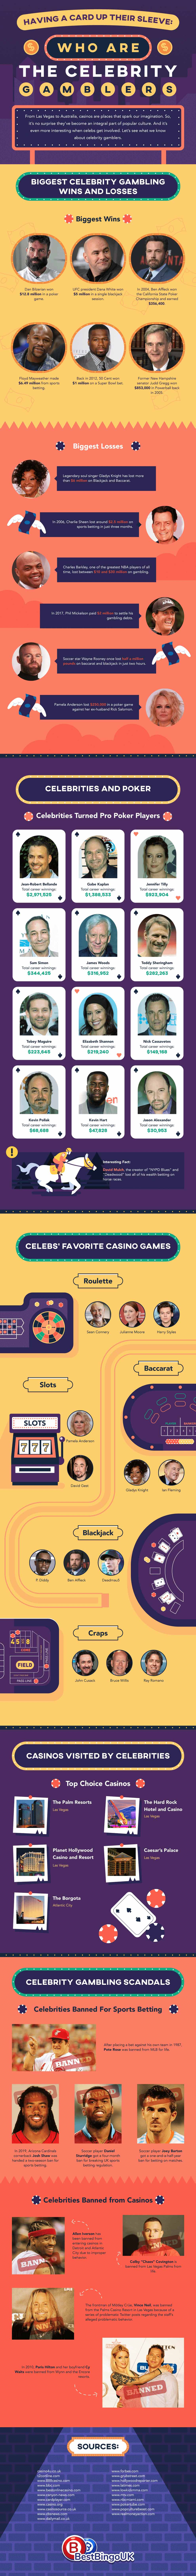 Cards Up Their Sleeves: Top Celebrity Gamblers